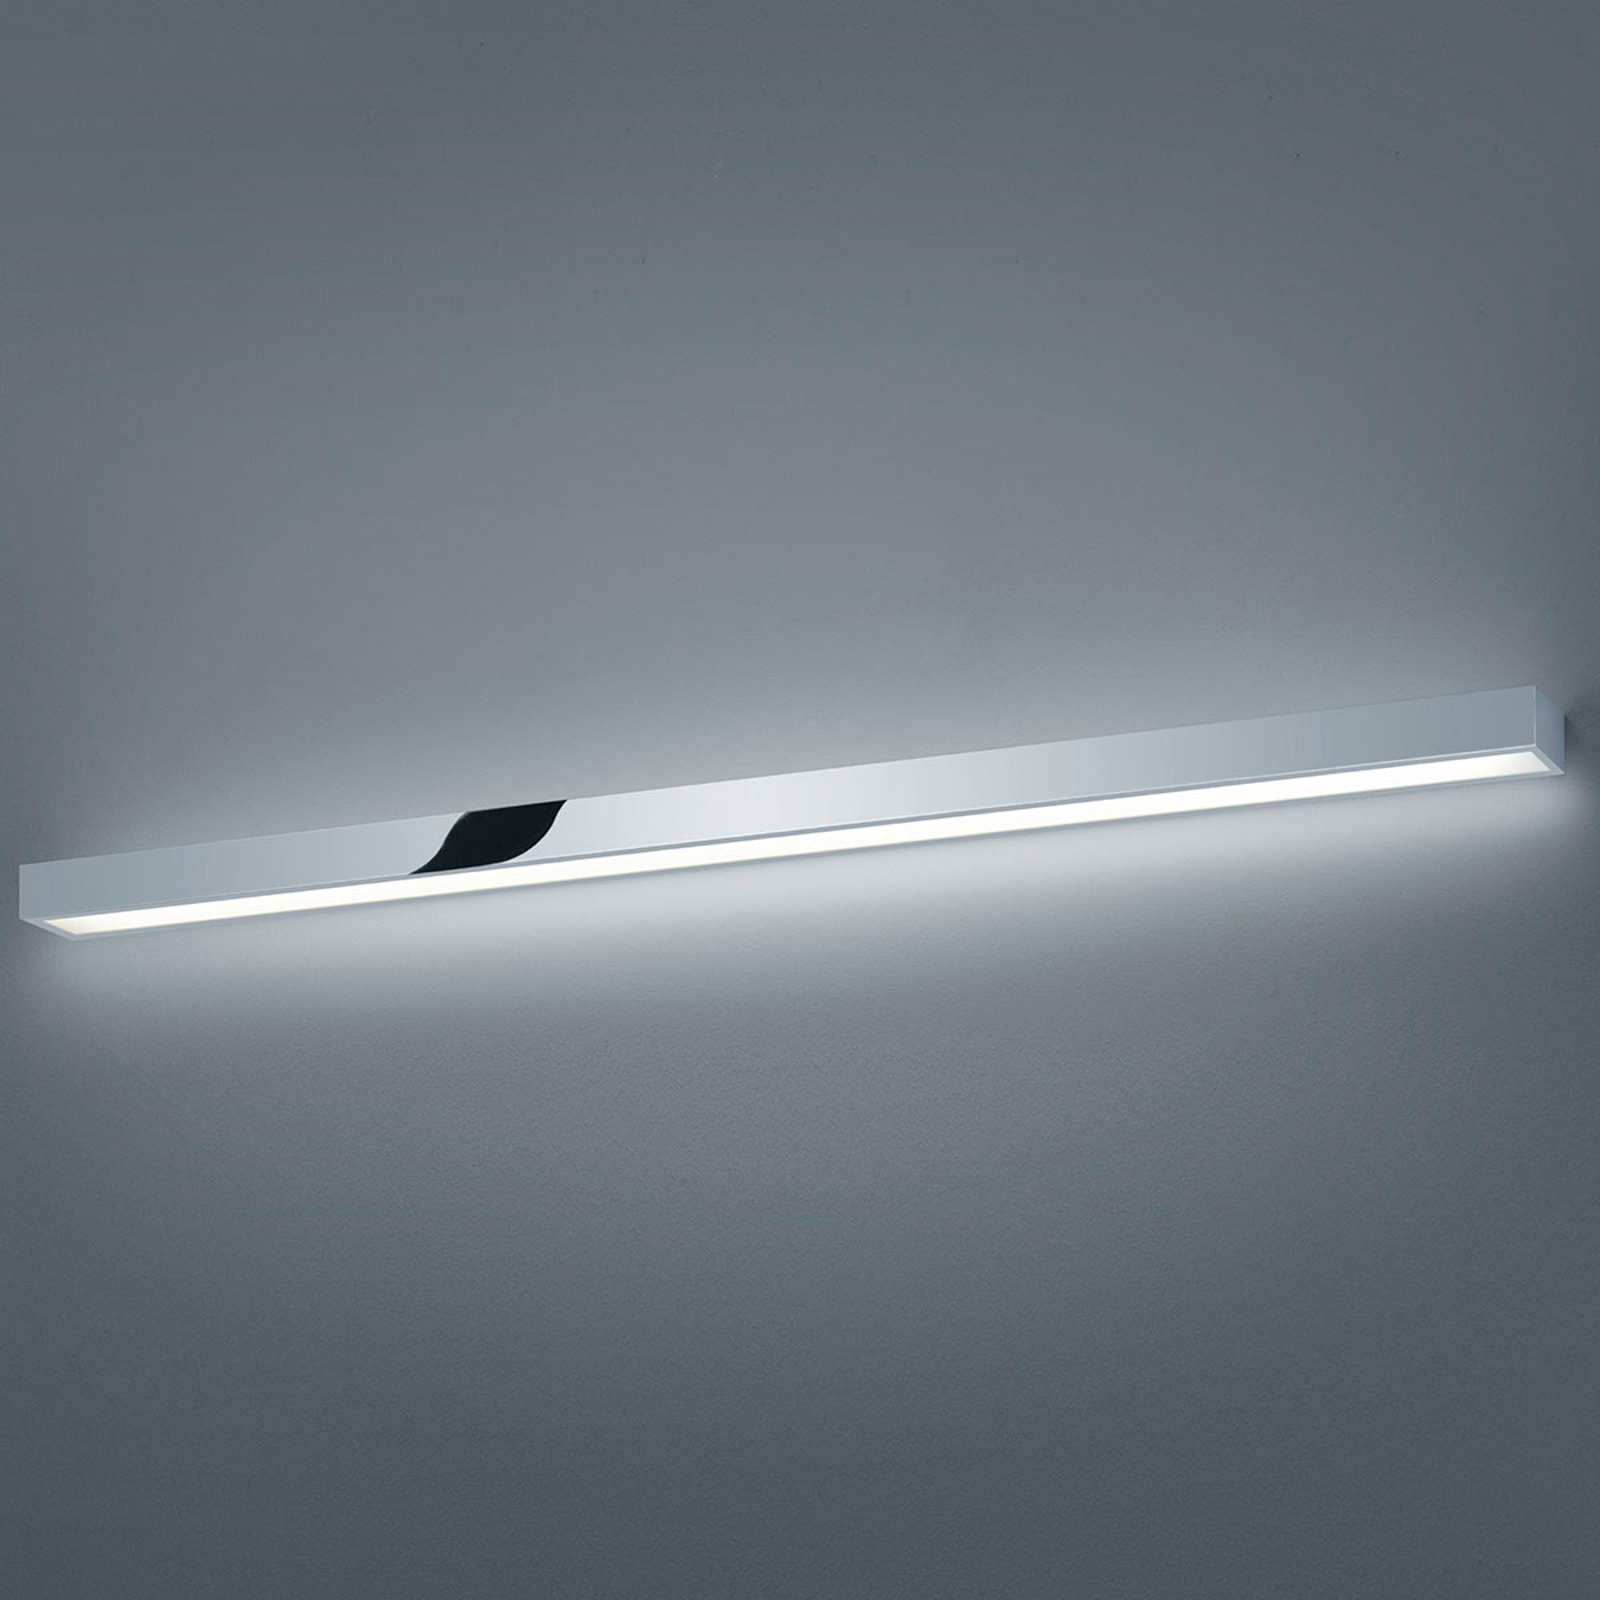 Produktové foto Helestra Helestra Theia – LED svítidlo nad zrcadlo, 120 cm